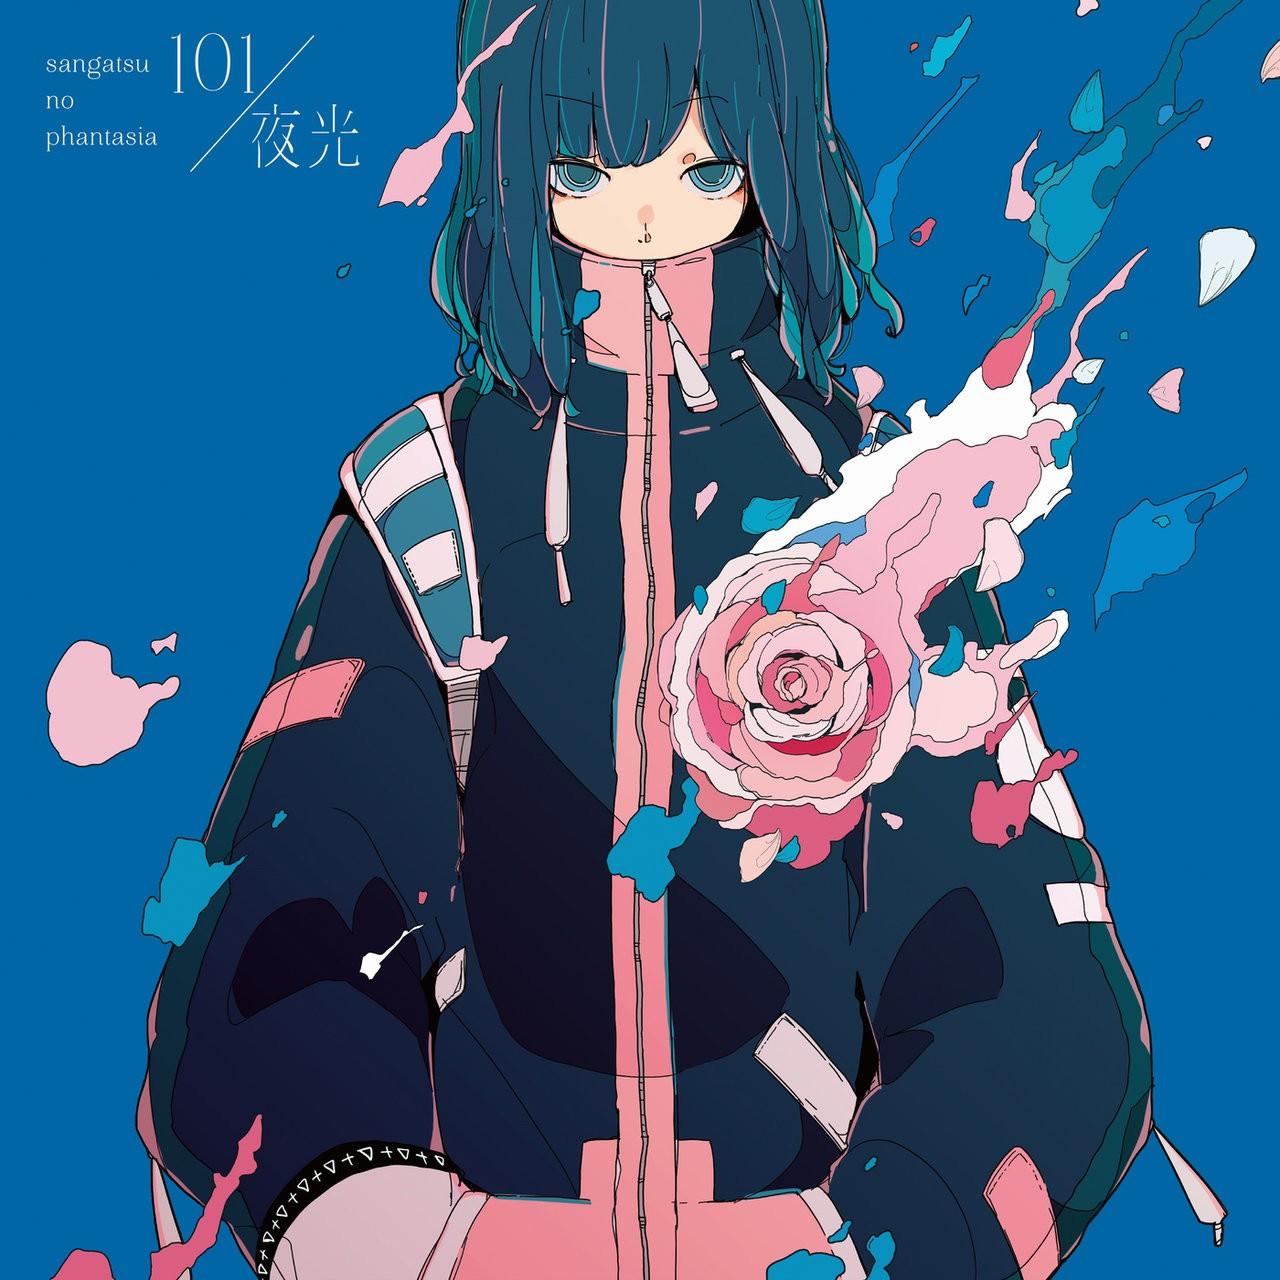 [Single] 三月のパンタシア (Sangatsu no Phantasia) – 101 / 夜光 [FLAC / 24bit Lossless / WEB] [2021.07.21]